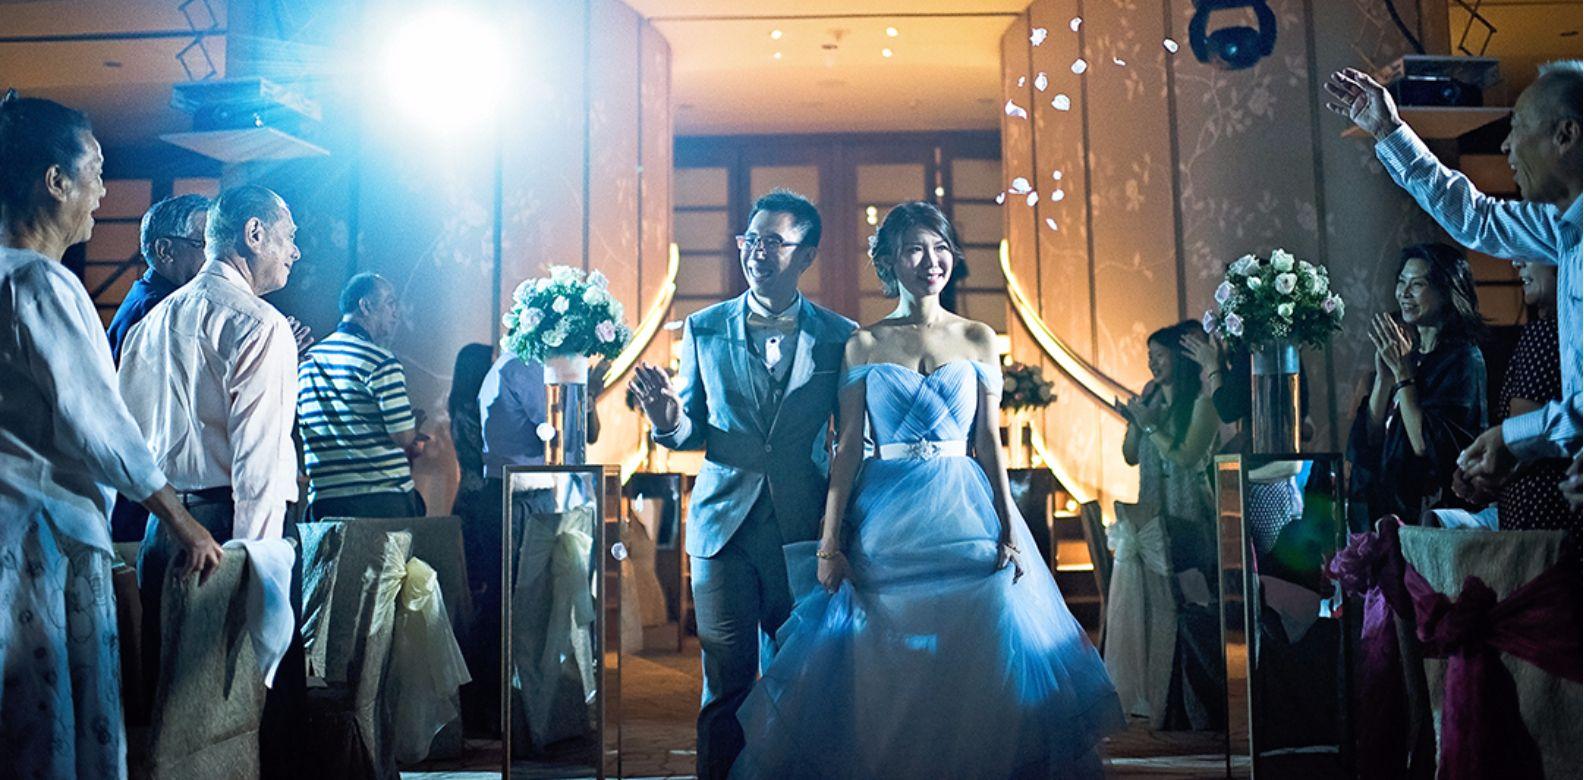 Wedding Etiquette: On Wedding Attire, Social Media And Guest ...